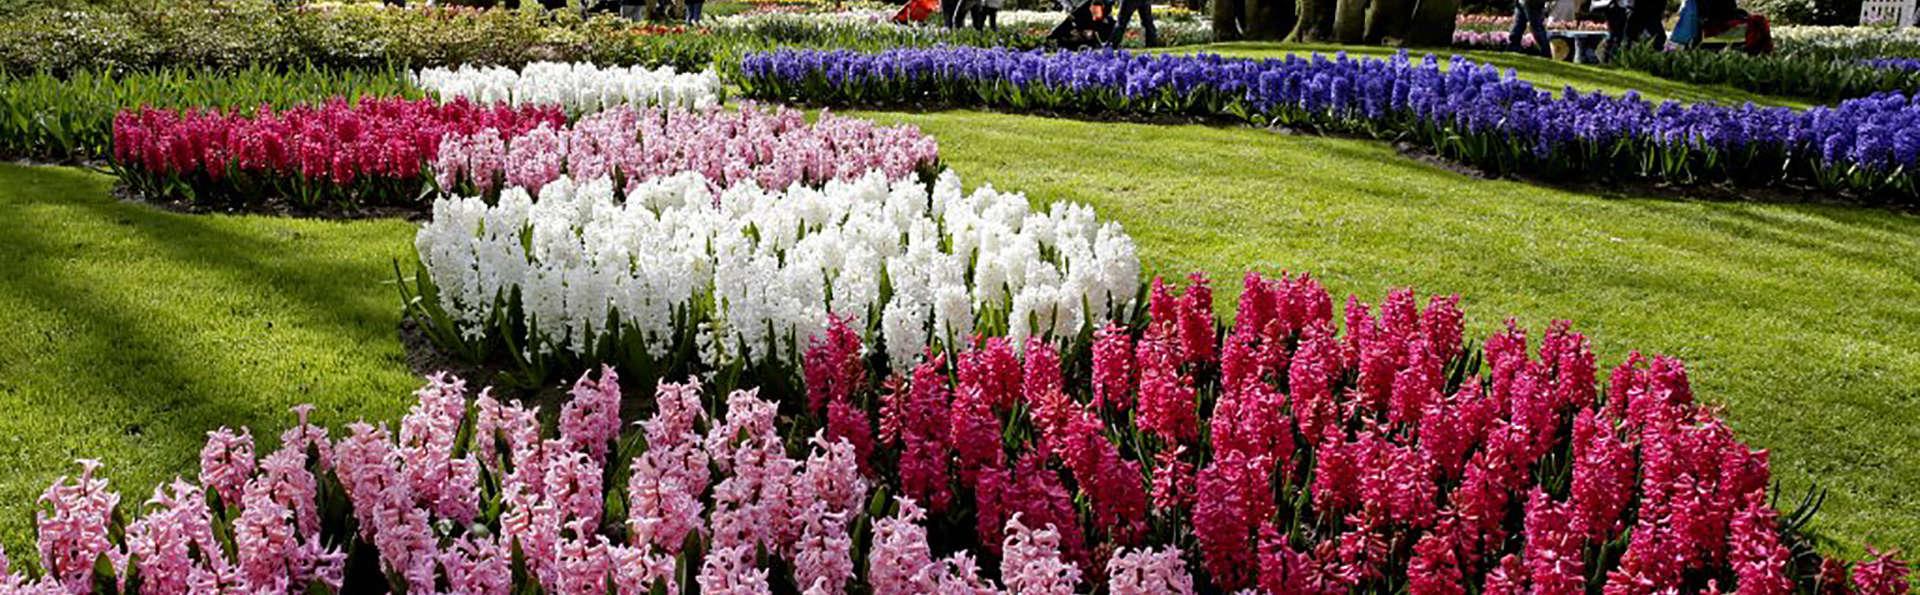 Keukenhof special: Luxe in Amsterdam en bloemenpracht in Keukenhof